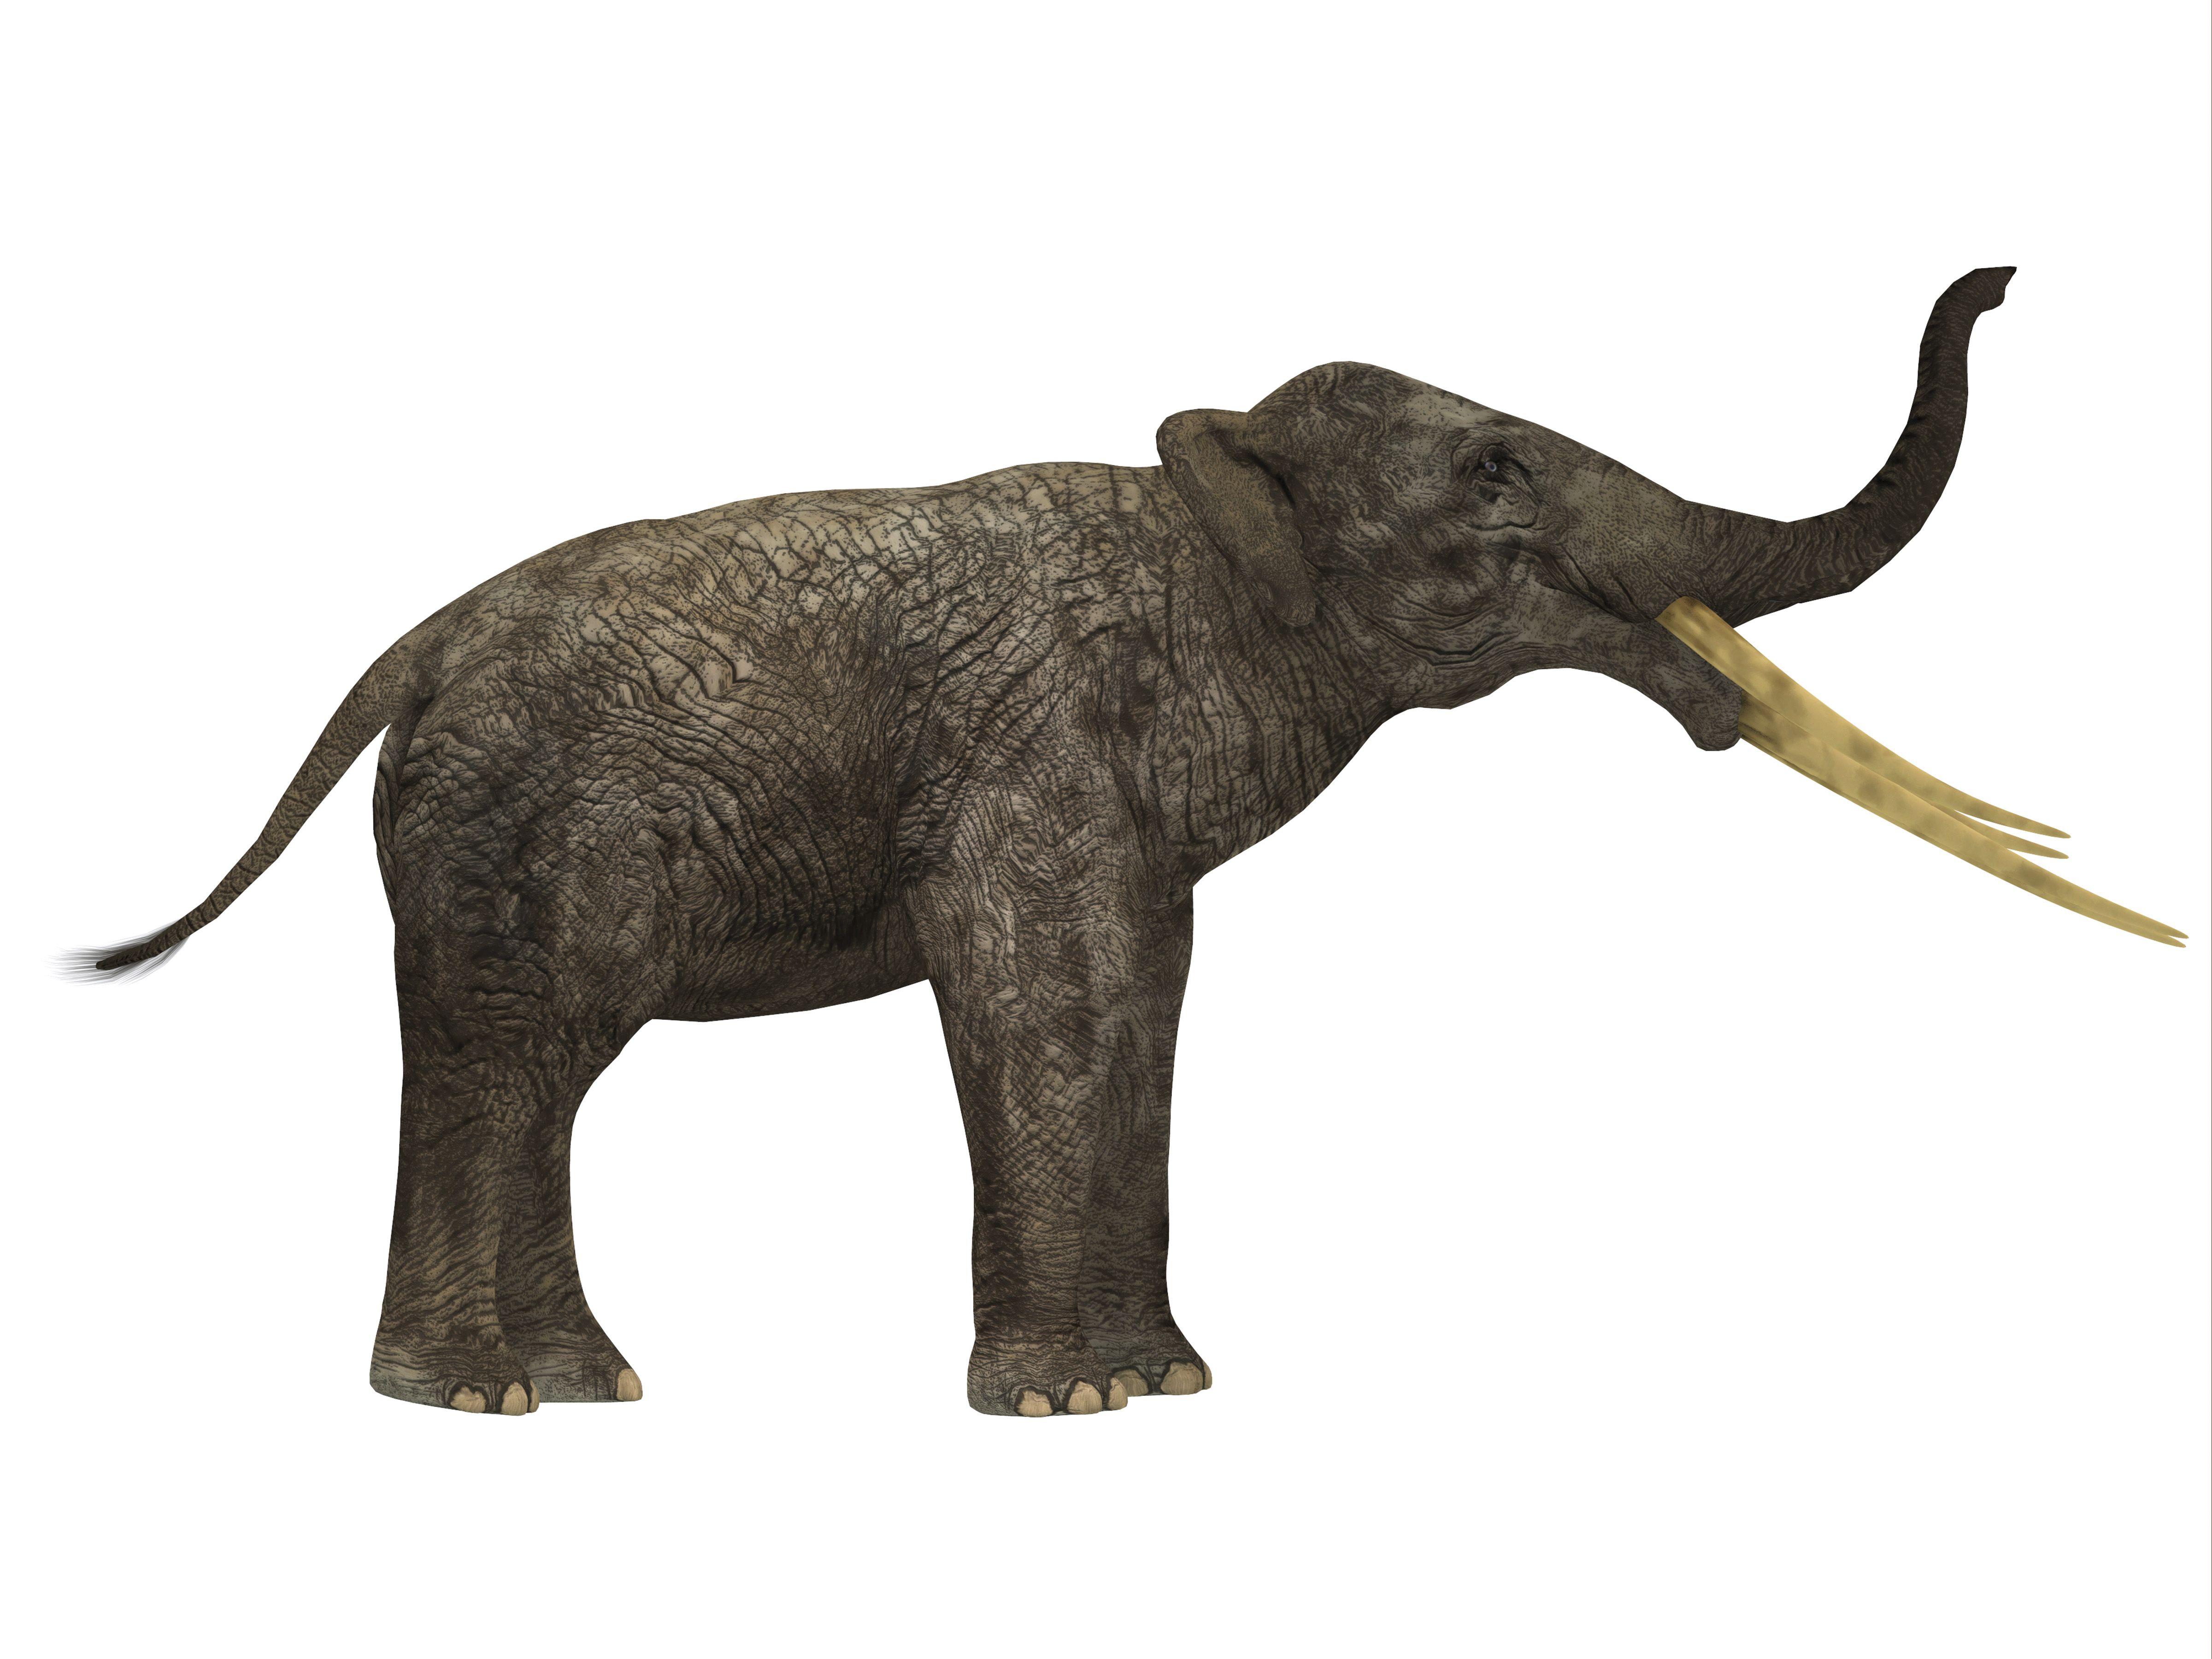 Stegotetrabelodon primitive elephant, side profile.